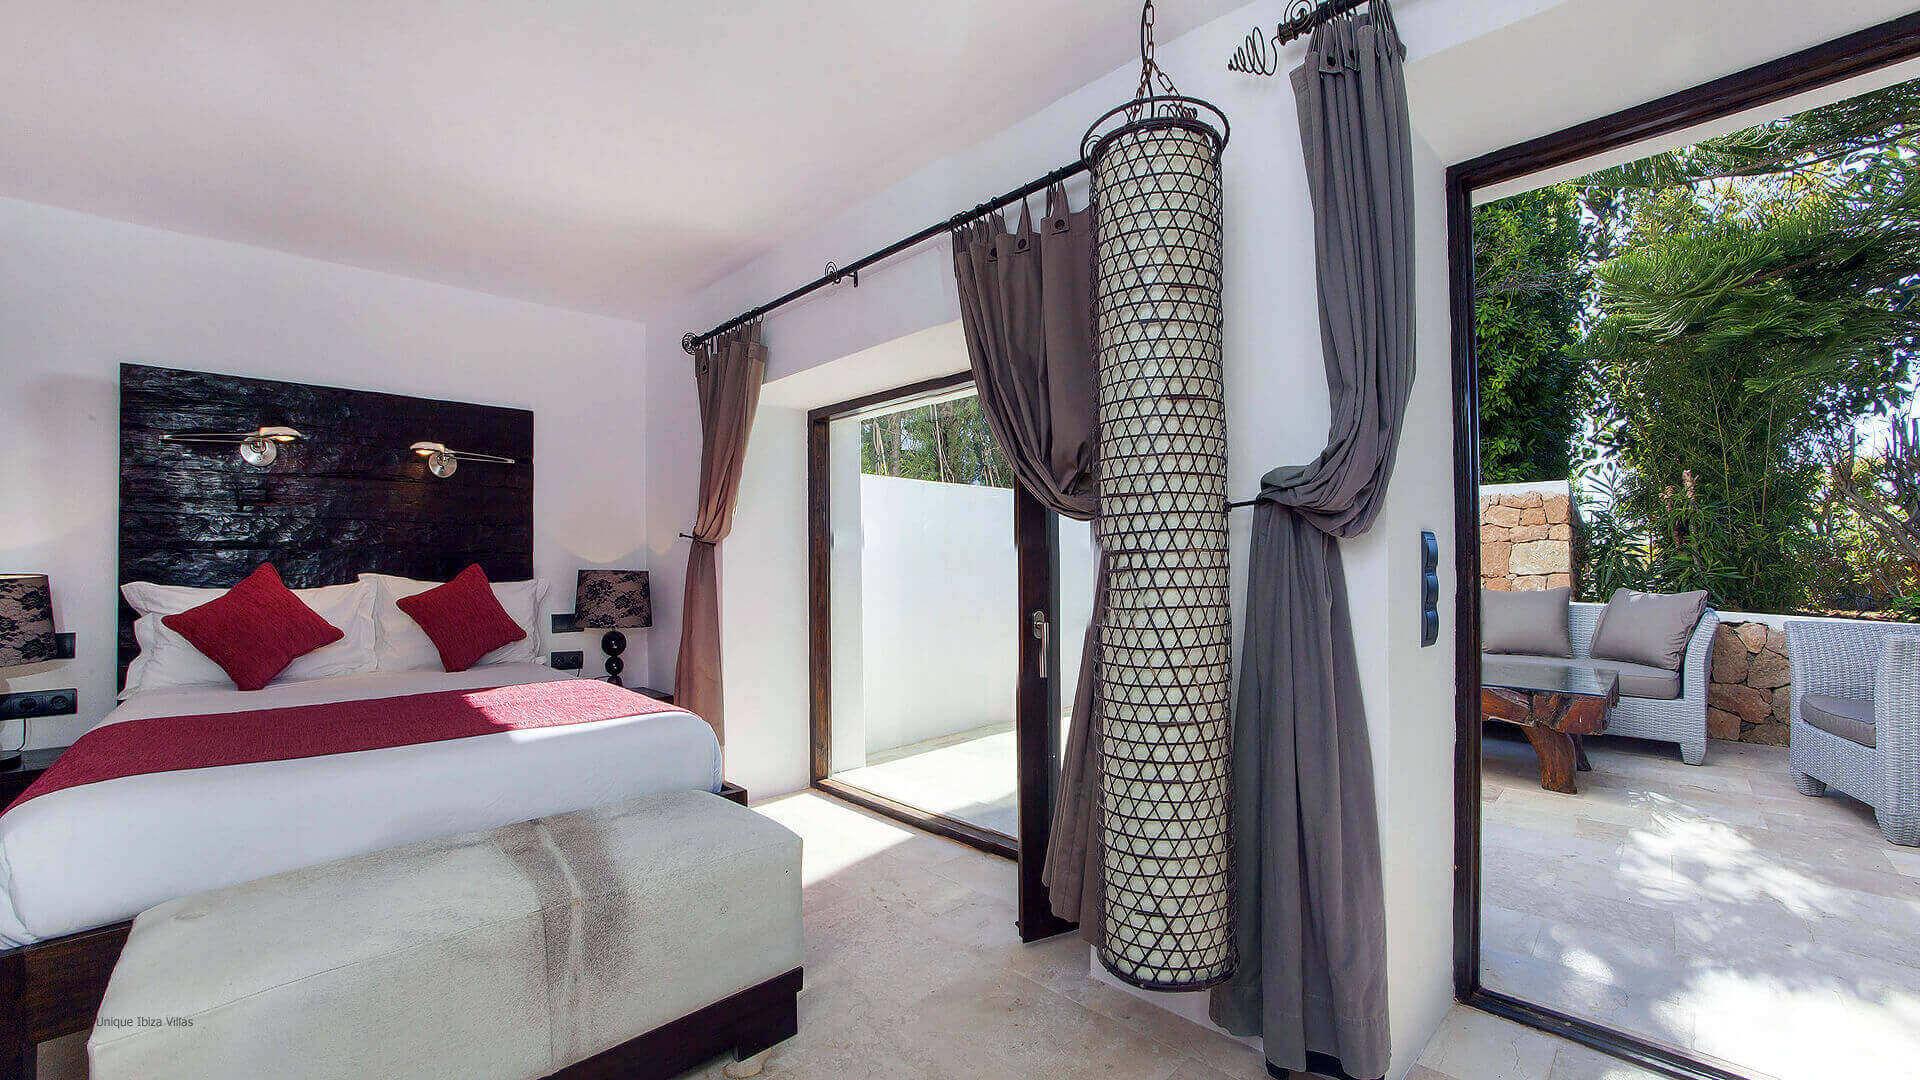 Villa Bes Ibiza 46 Bedrooom 4